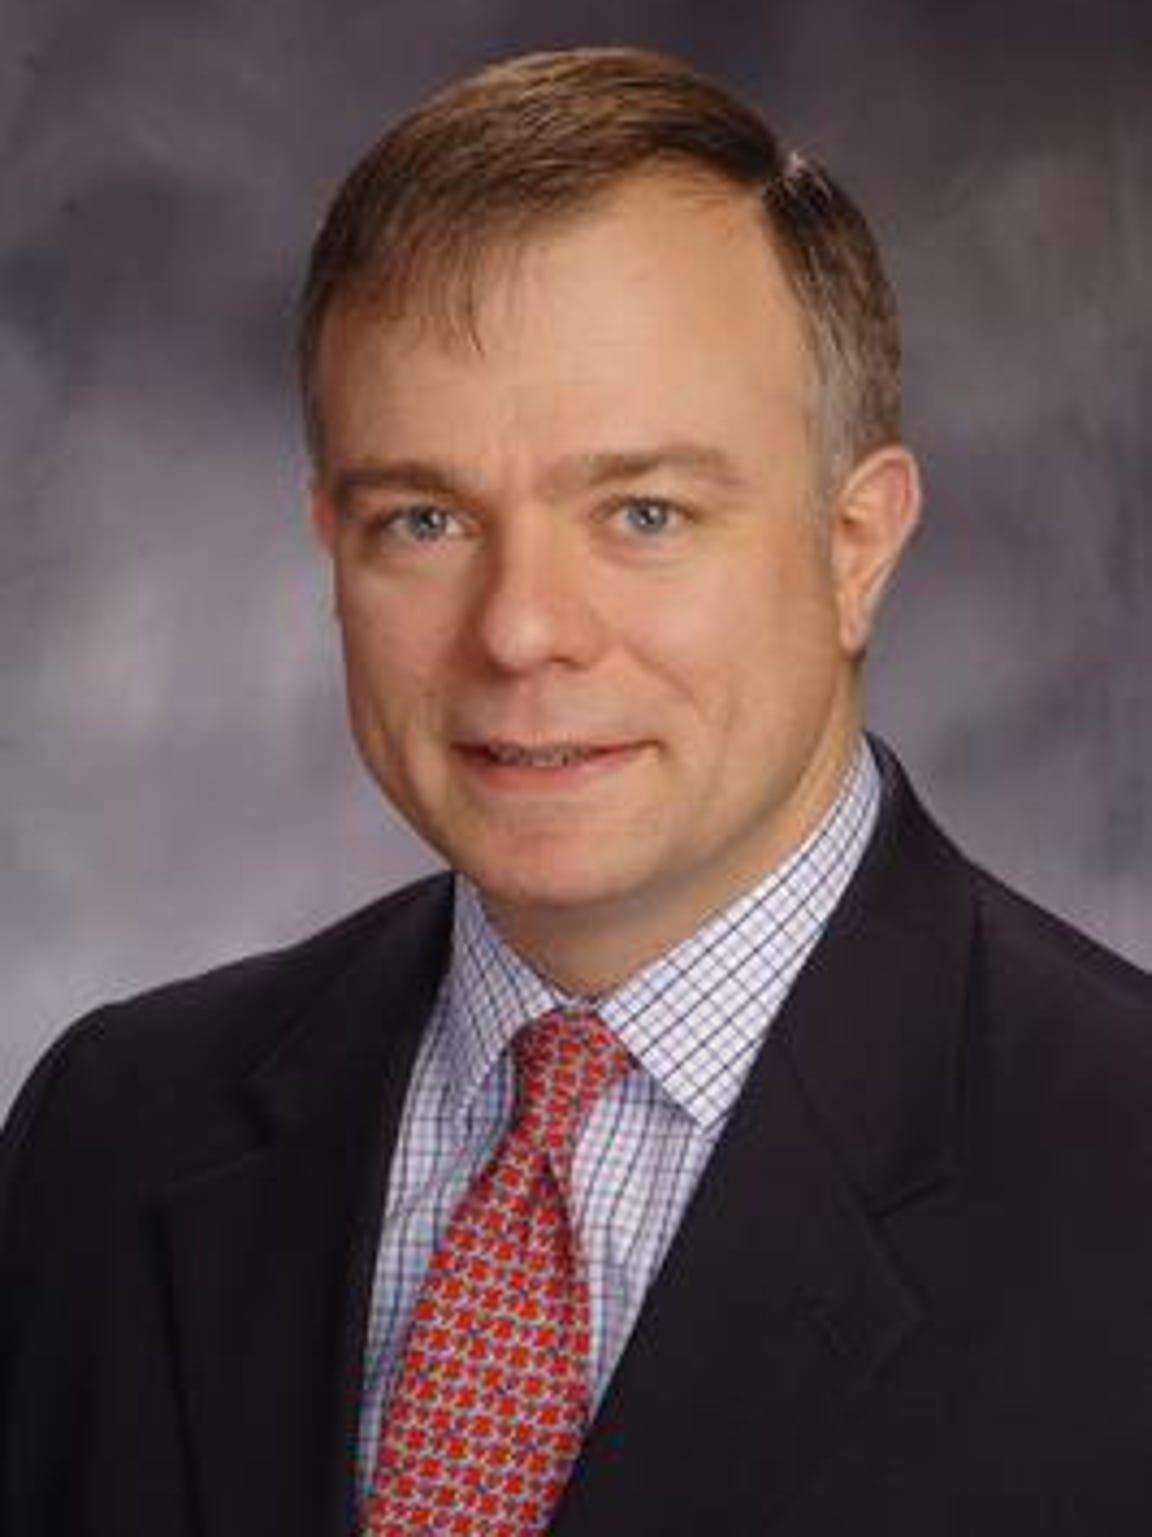 Greene County Clerk Shane Schoeller